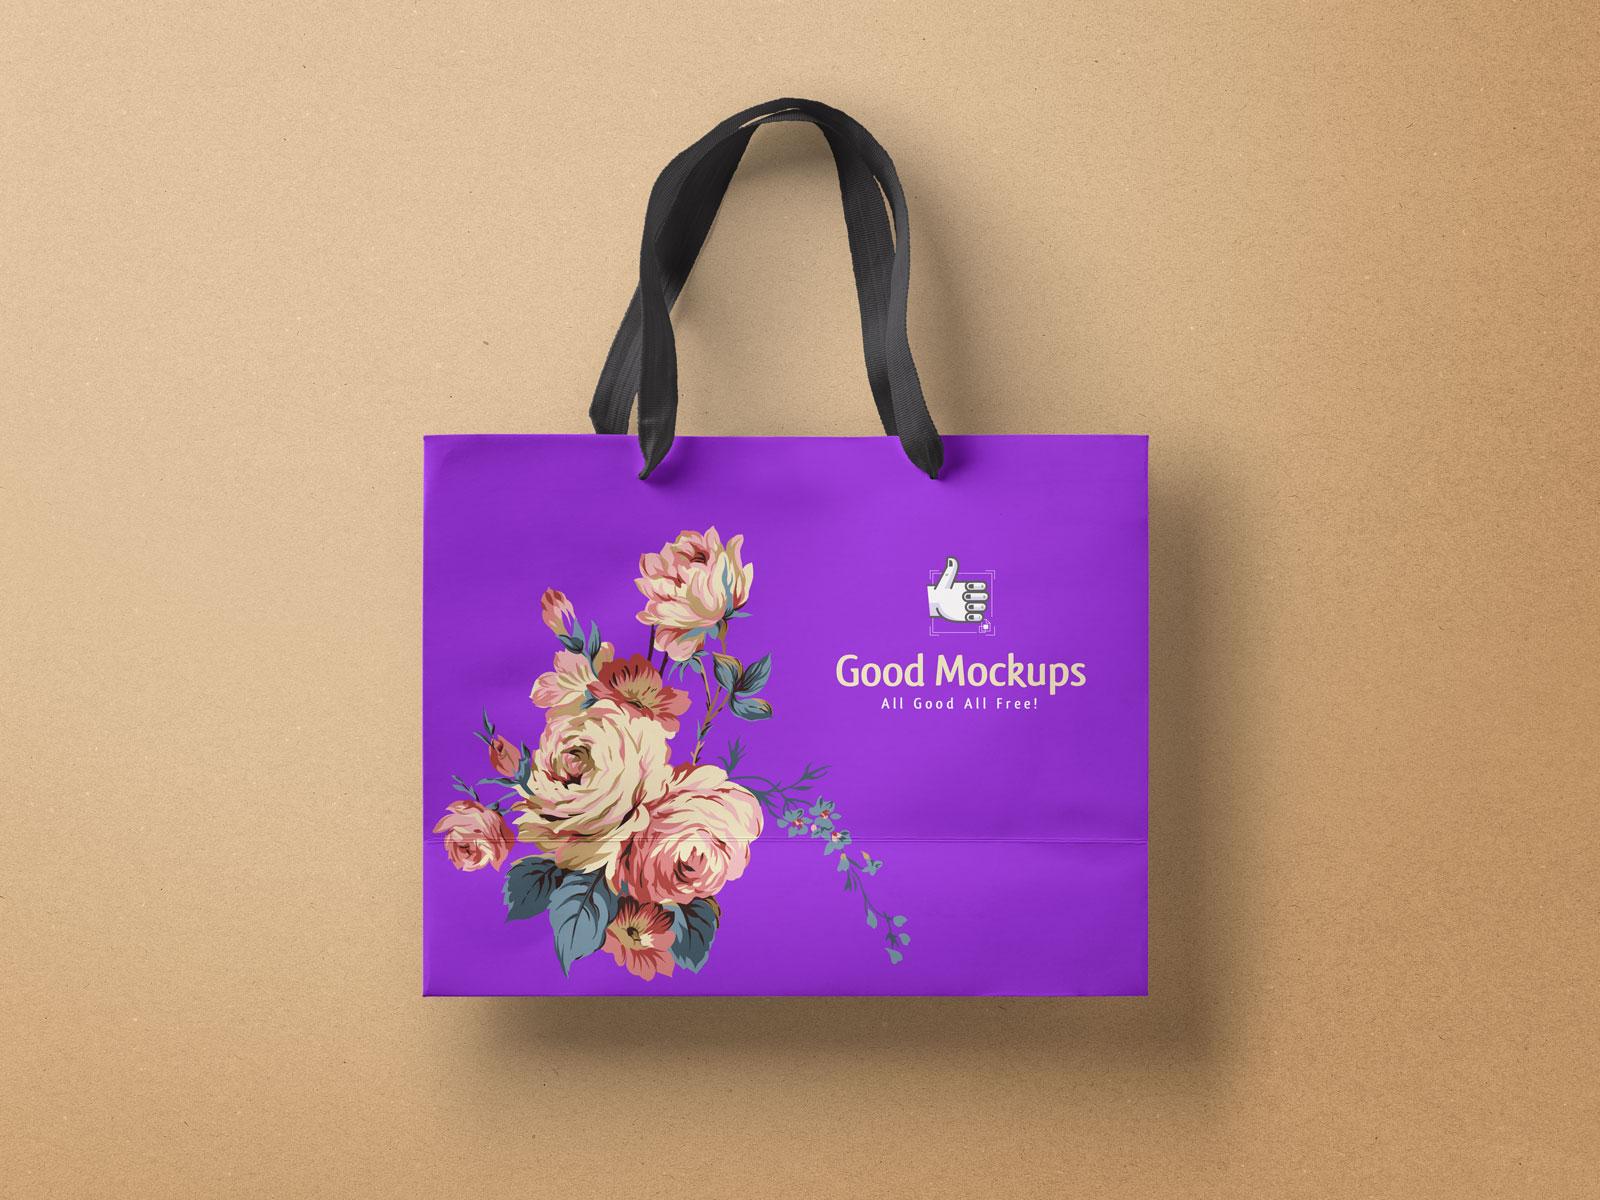 Free-High-Quality-Paper-Shopping-Bag-Mockup-PSD-File